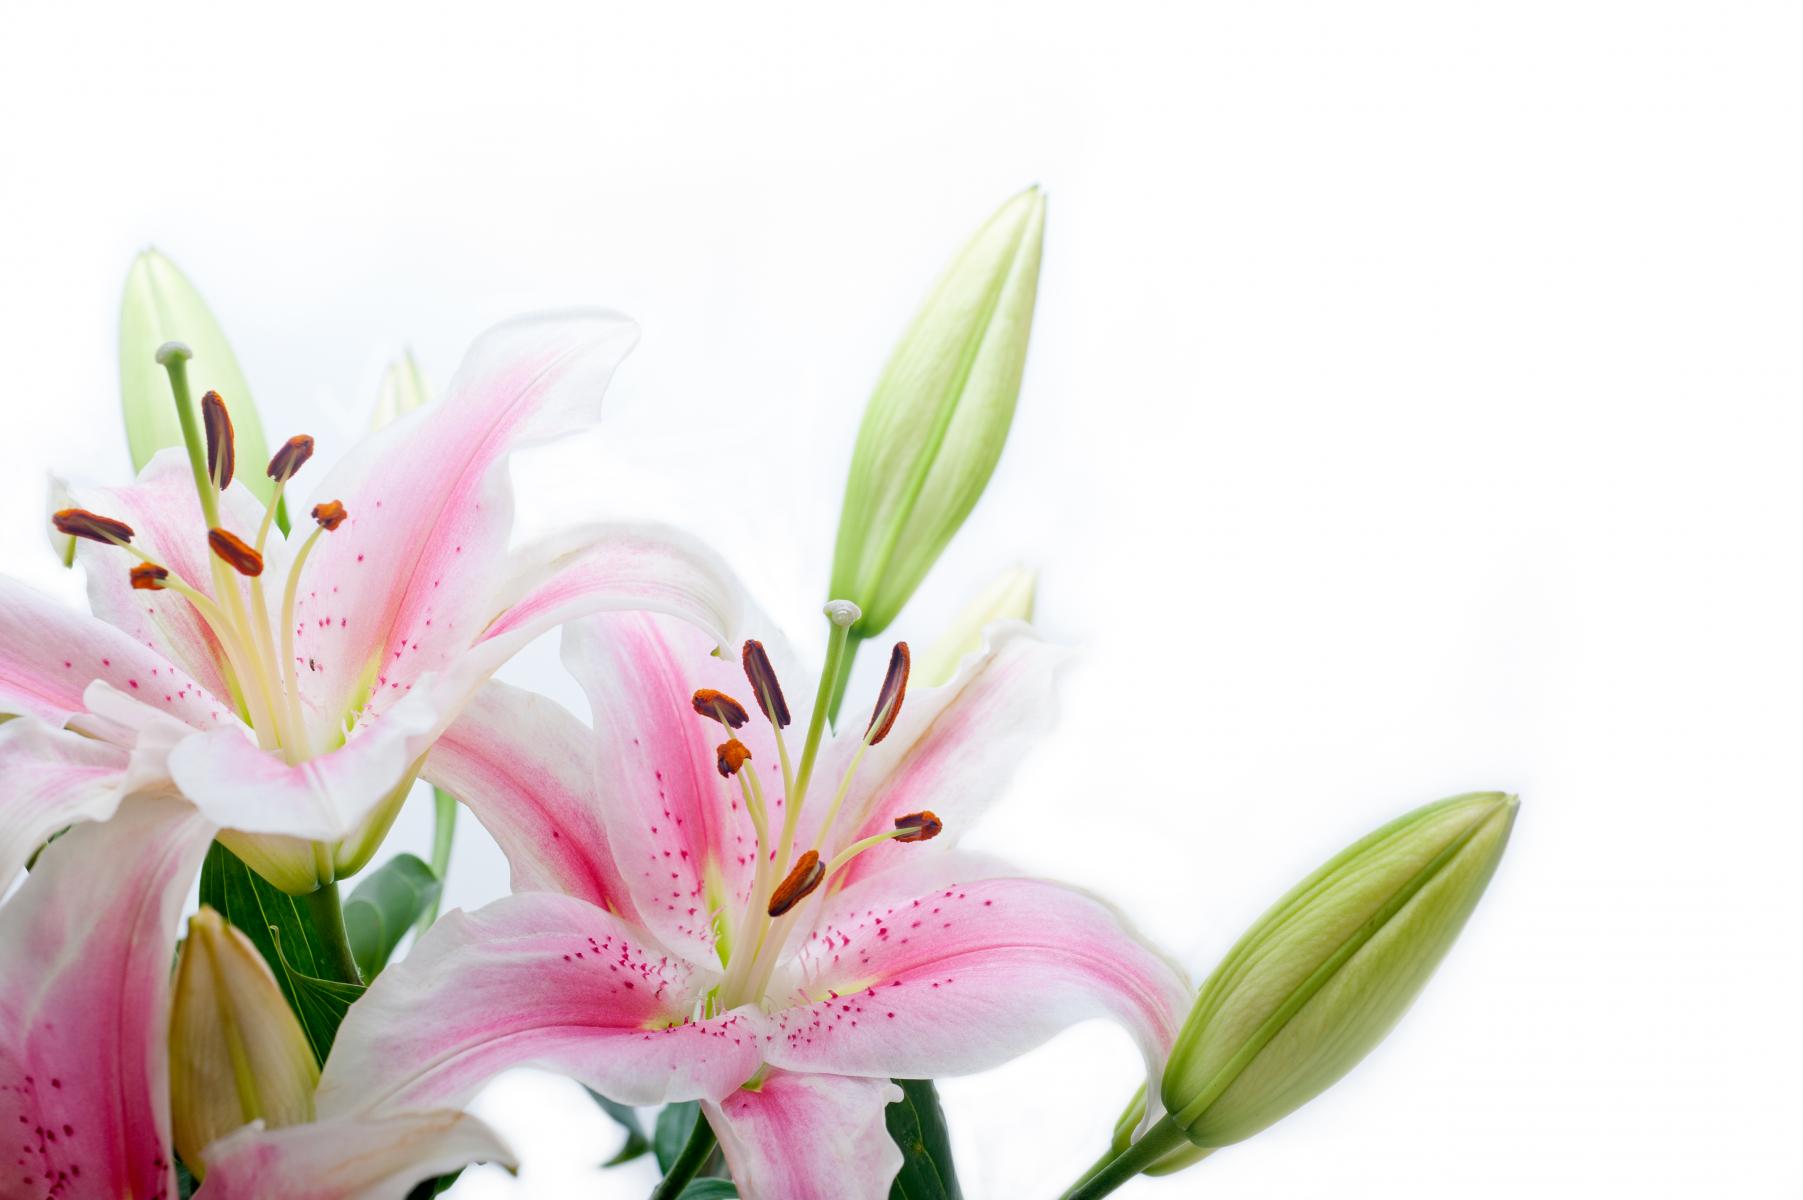 Rosa og hvite liljer med pollenbærere